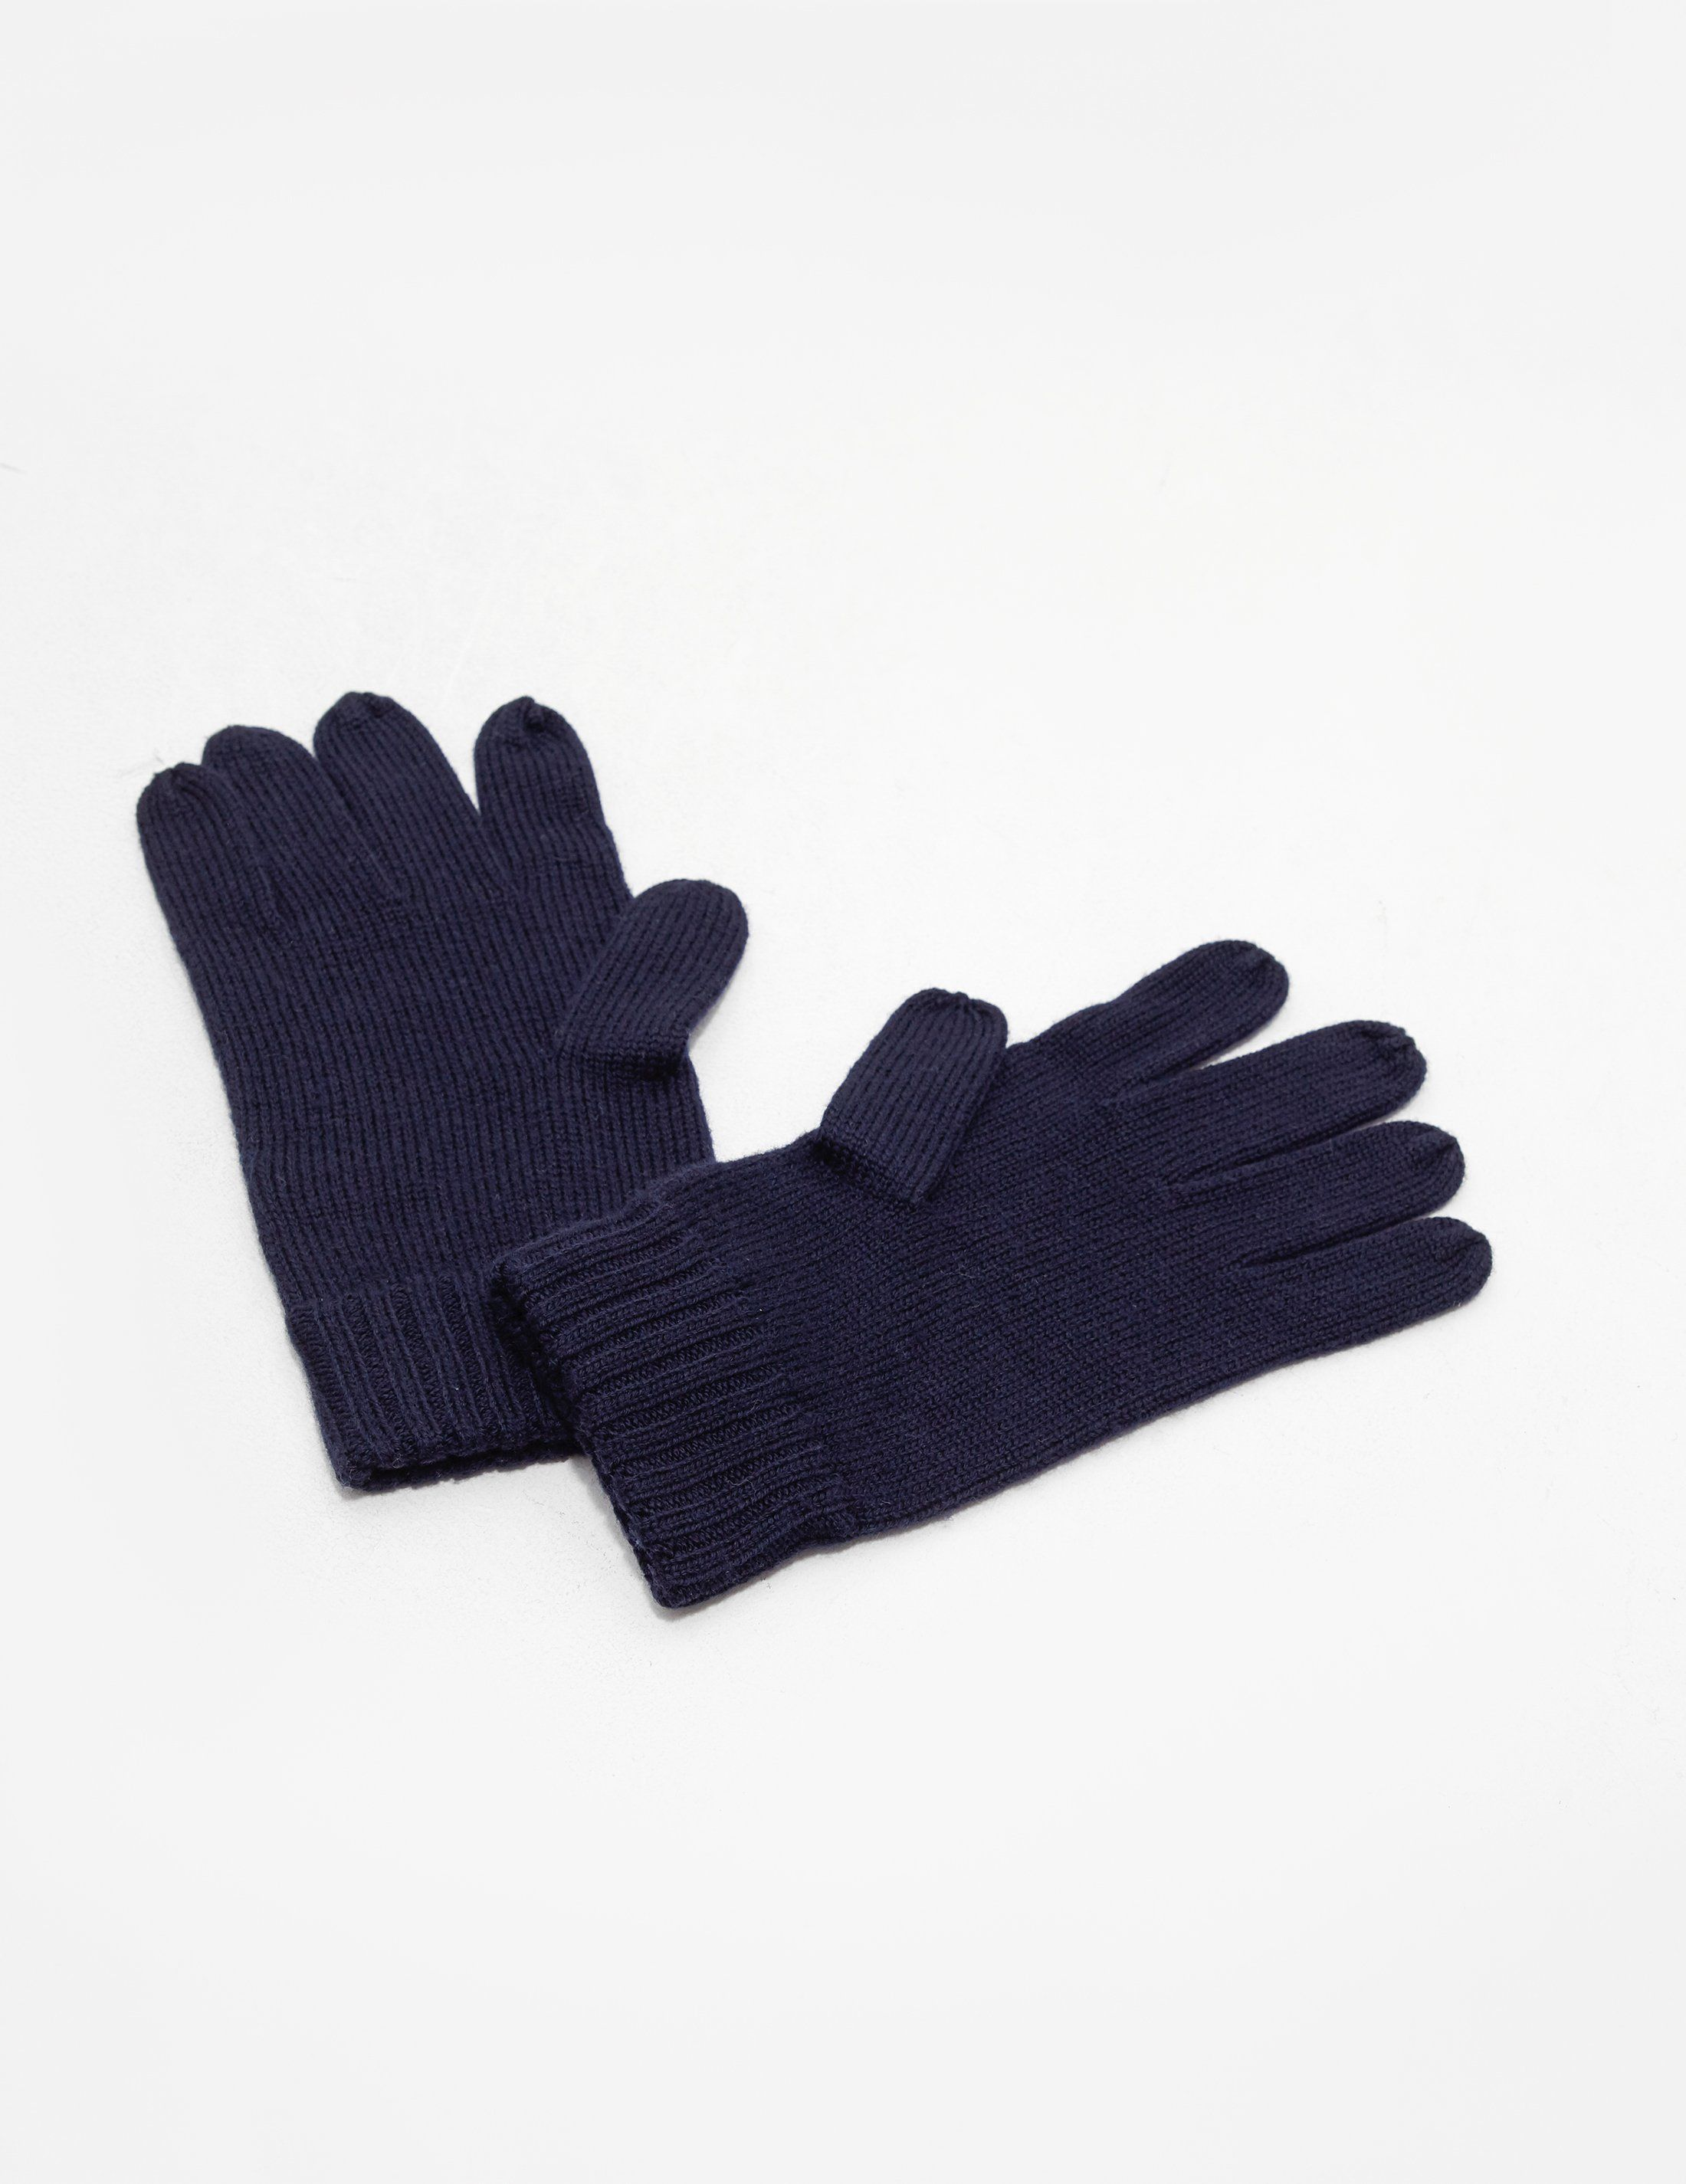 Polo Ralph Lauren Knitted Gloves